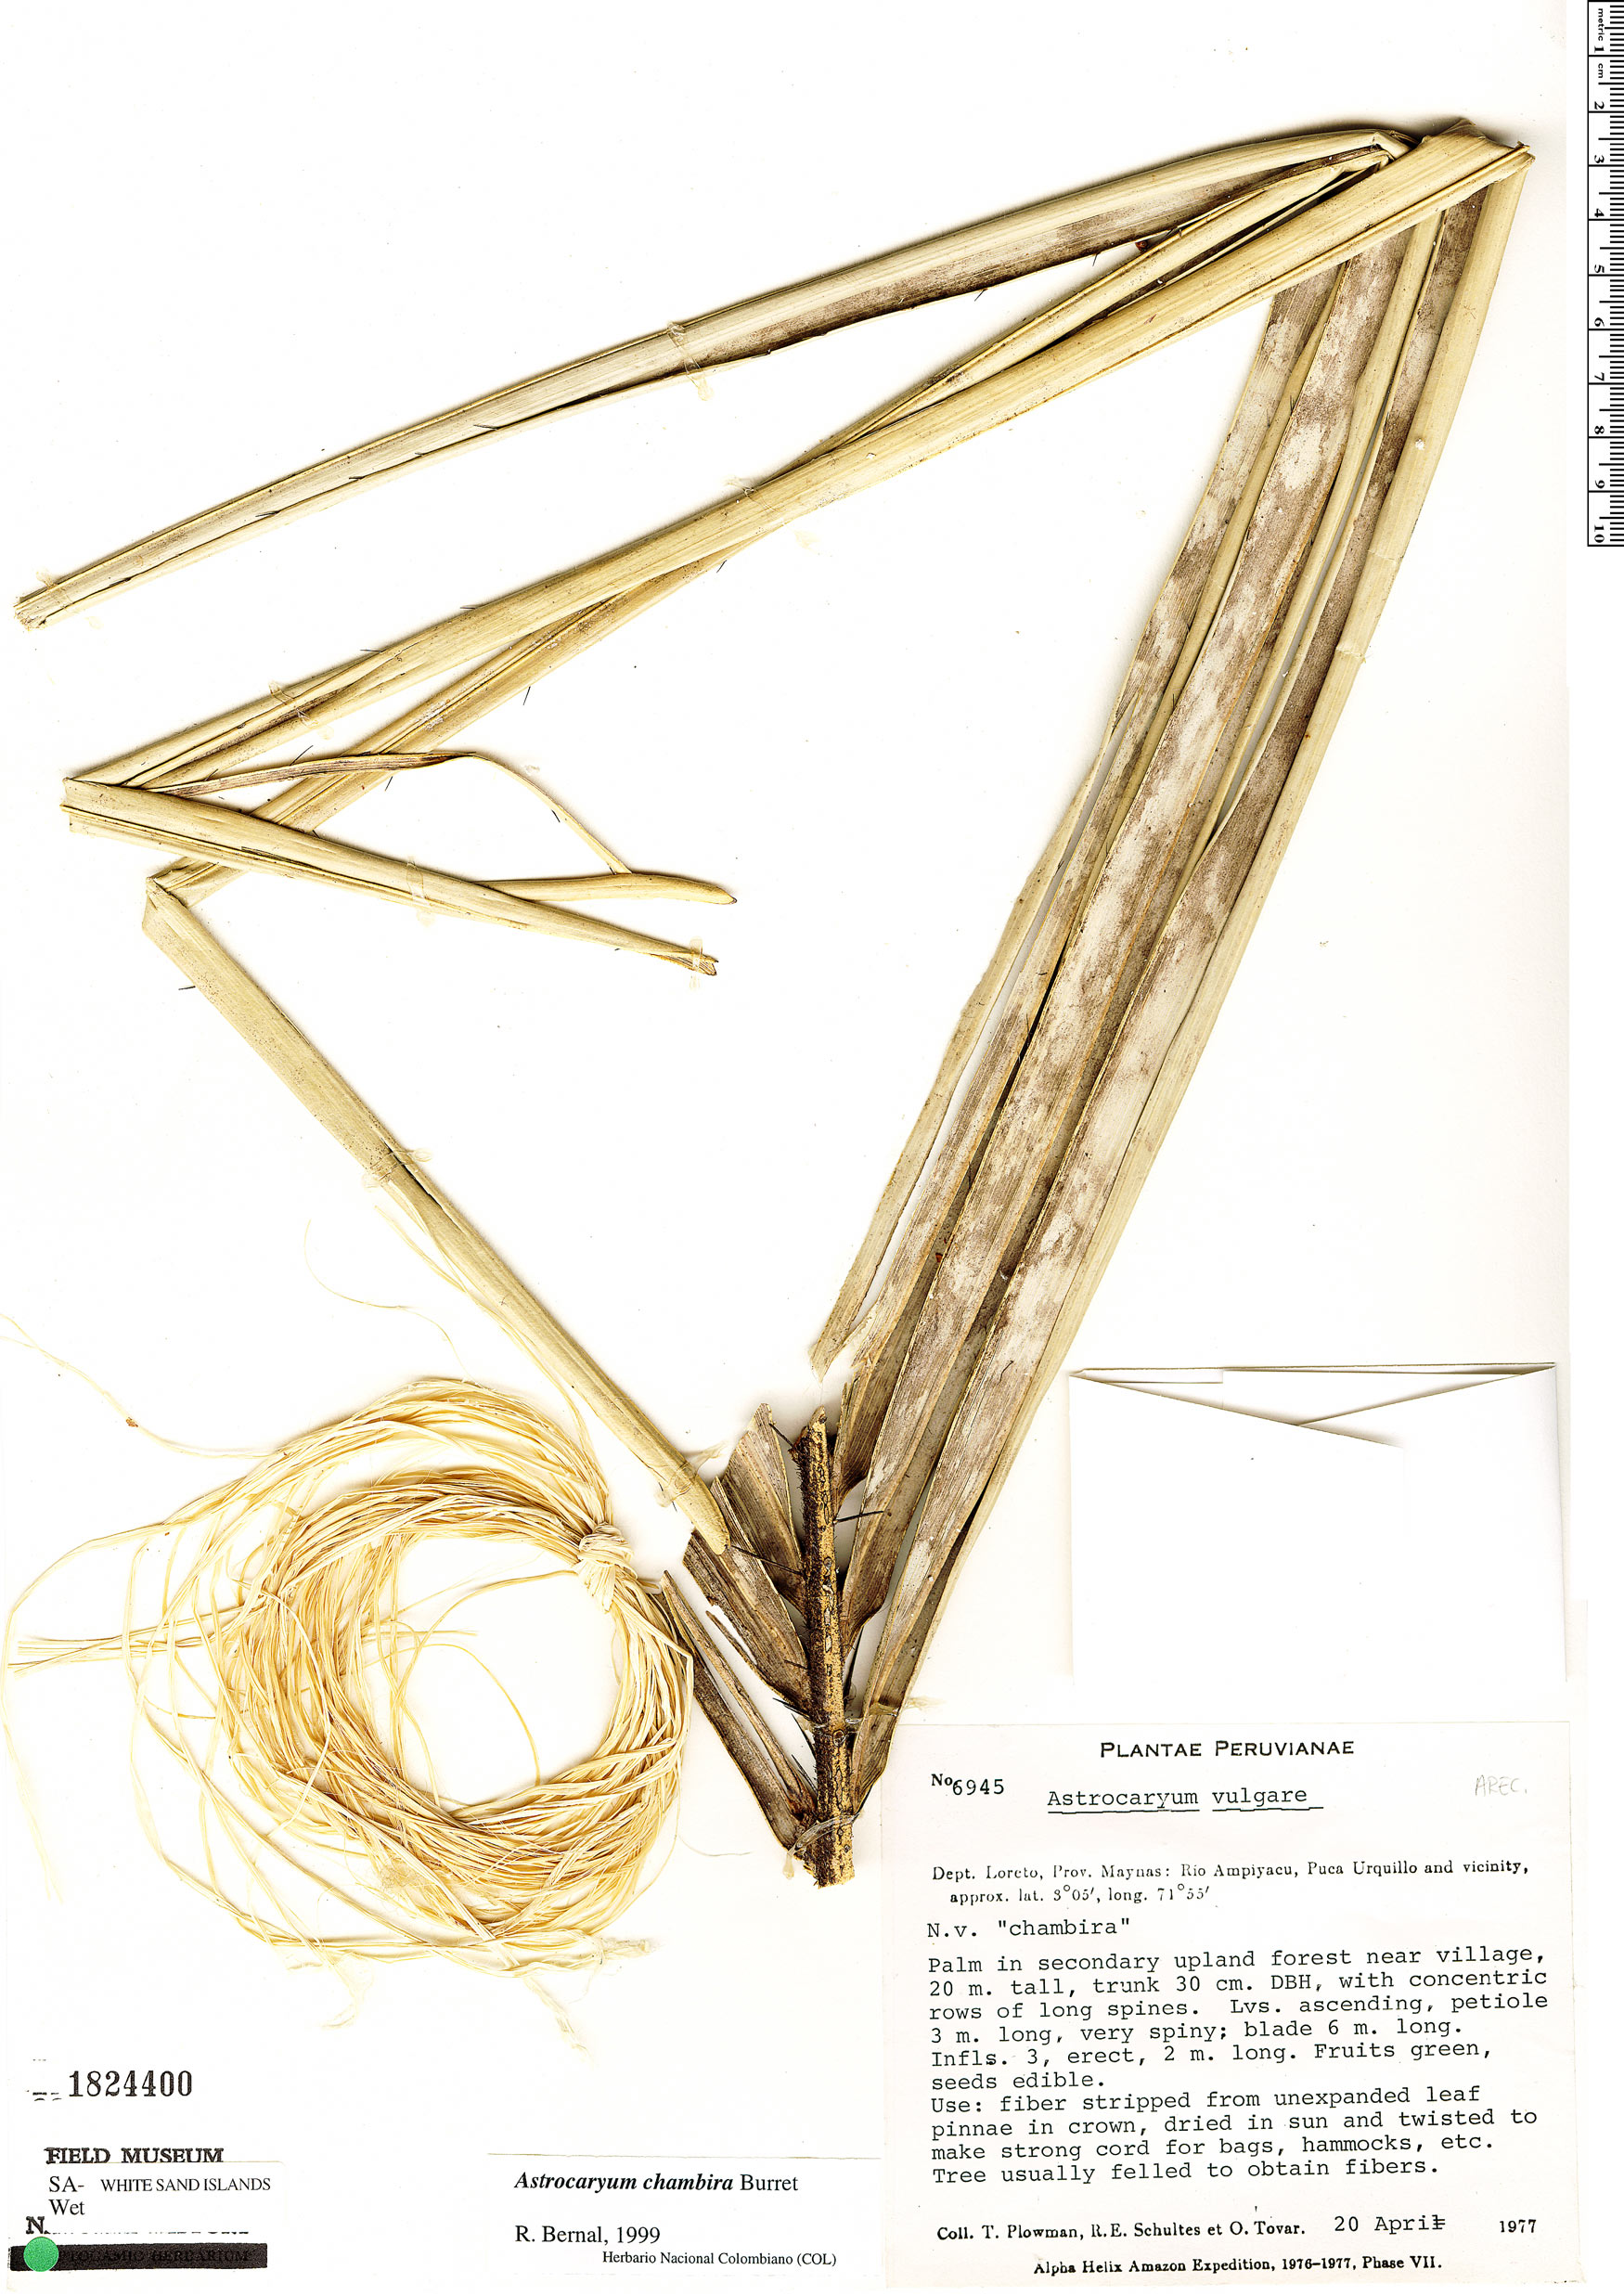 Specimen: Astrocaryum chambira